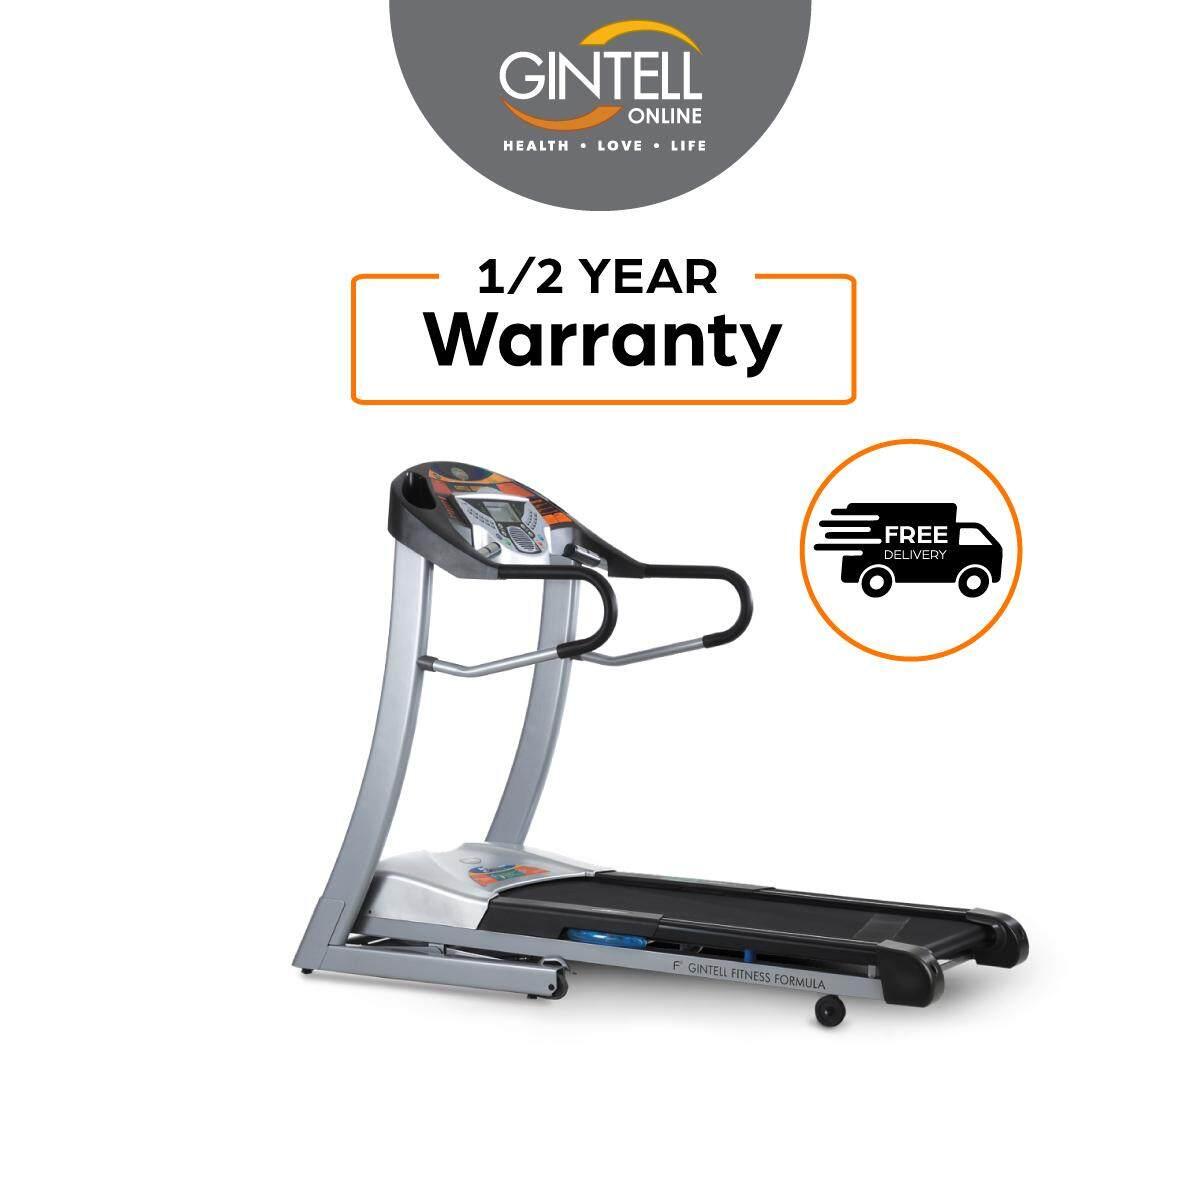 GINTELL FT22 CyberAIR Treadmill (Showroom Unit)